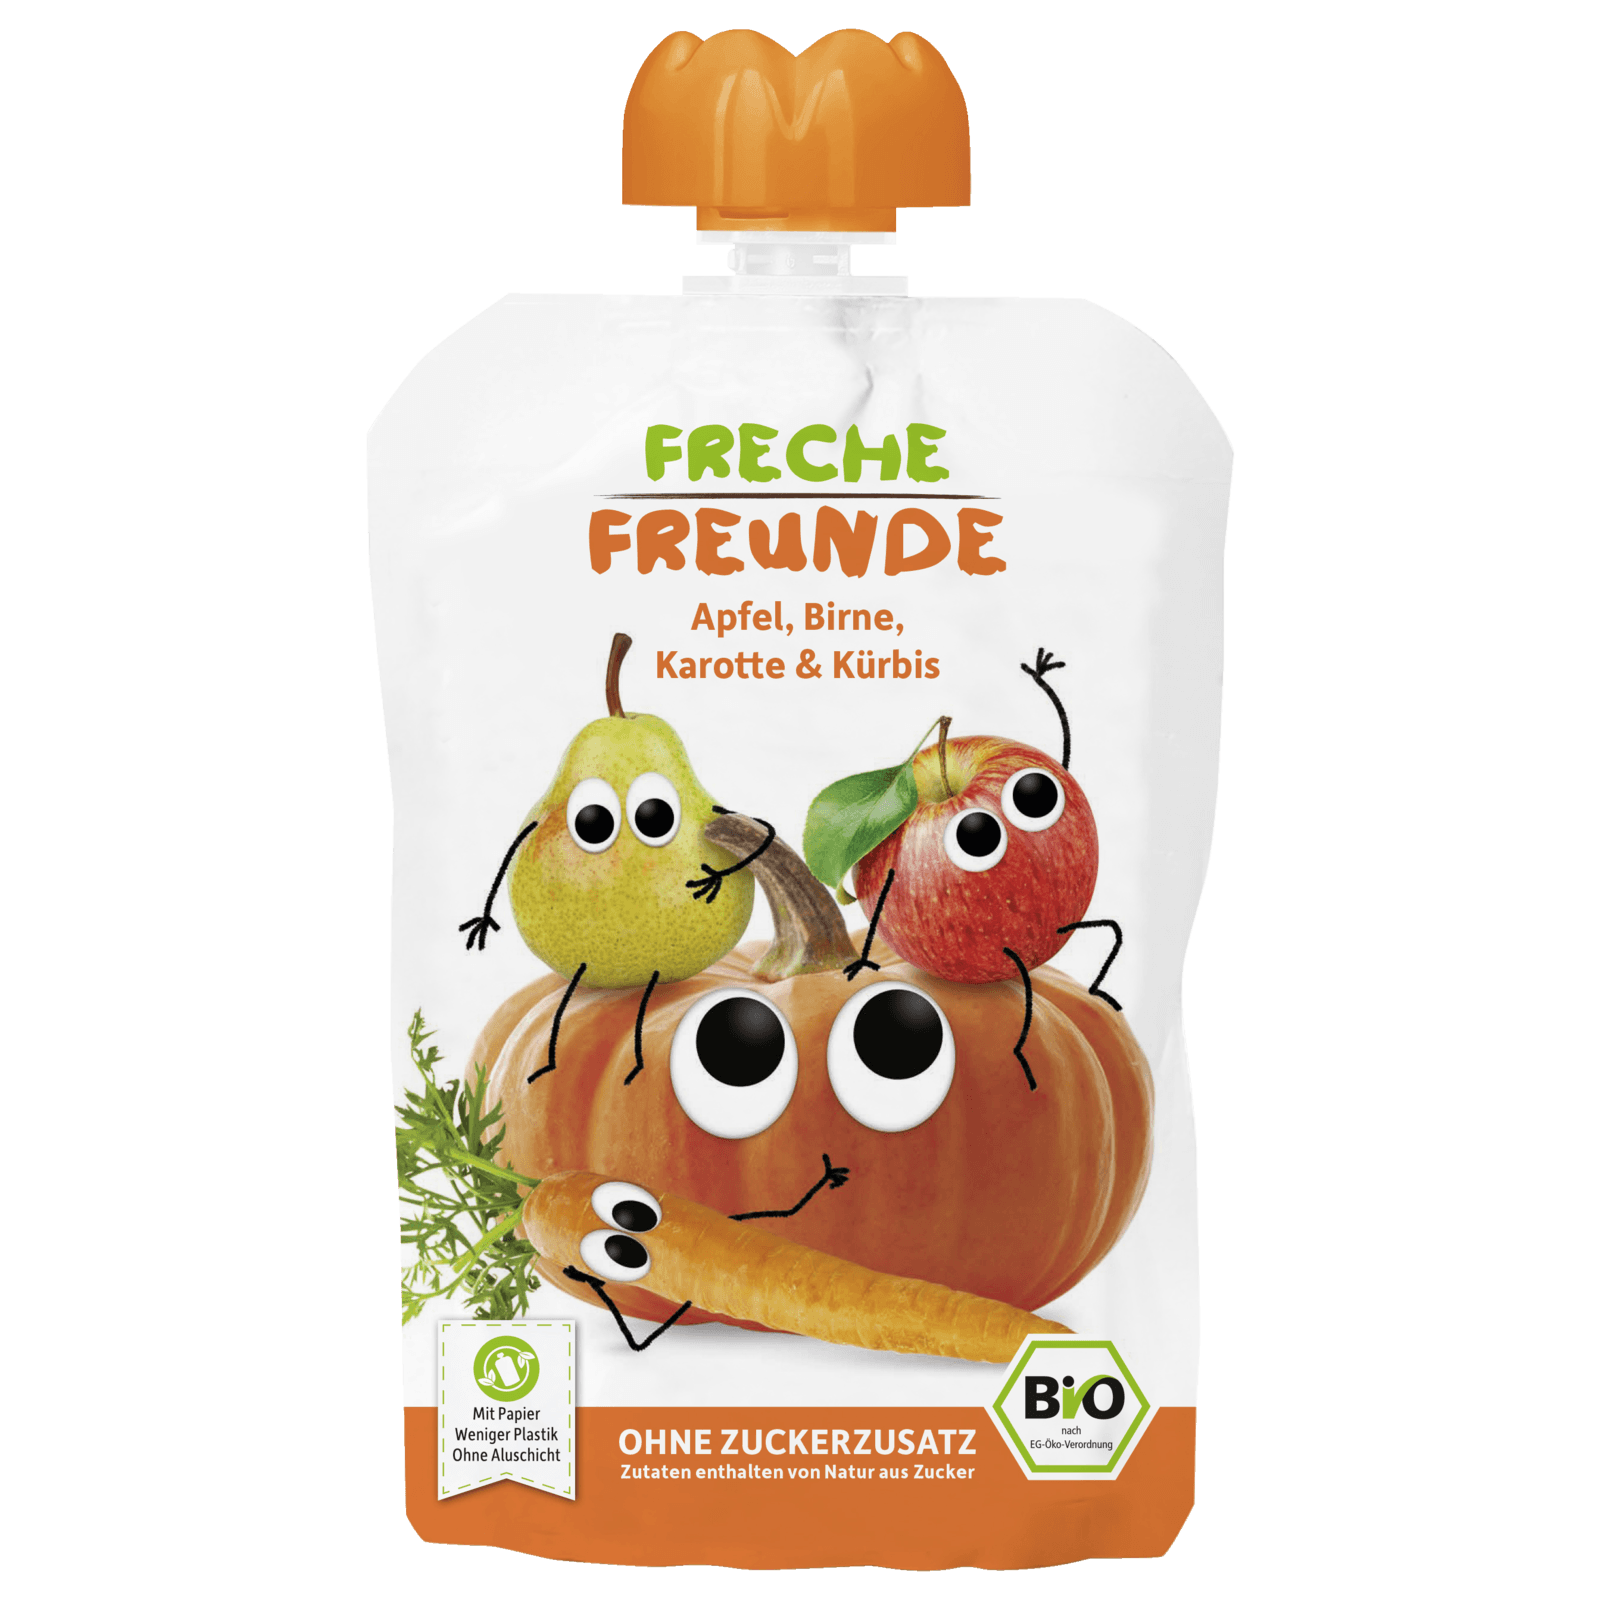 Erdbär Freche Freunde Apfel, Birne, Karotte & Kürbis 100g